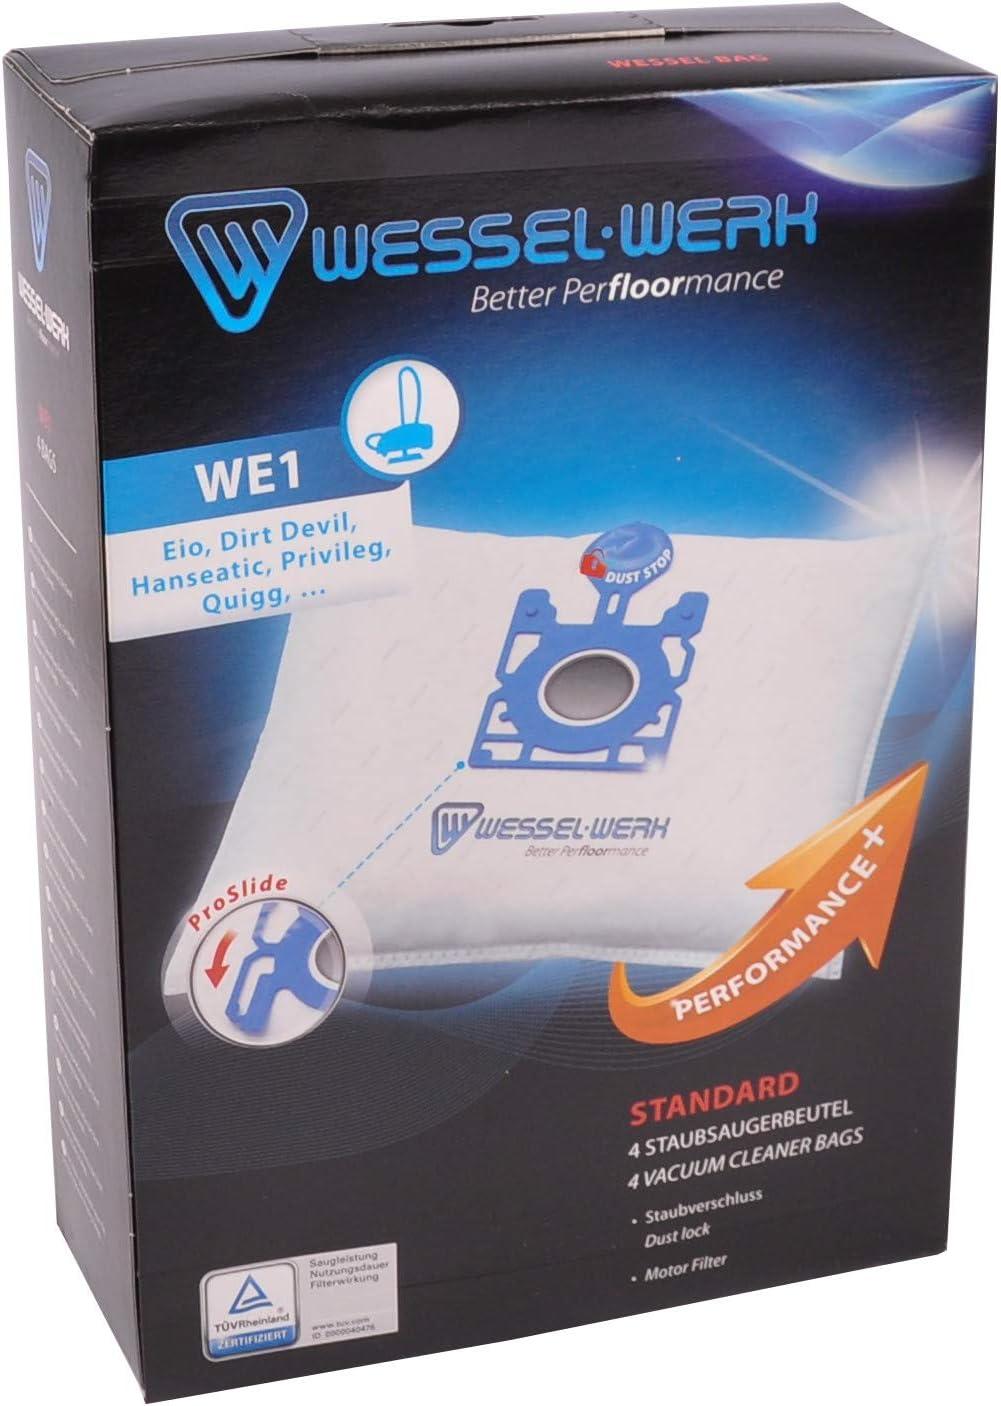 Wessel Werk - 109083312 WesselBag WE1 aspiradora Bolsas para Eio, Dirt Devil, hanseática Quigg: Amazon.es: Hogar